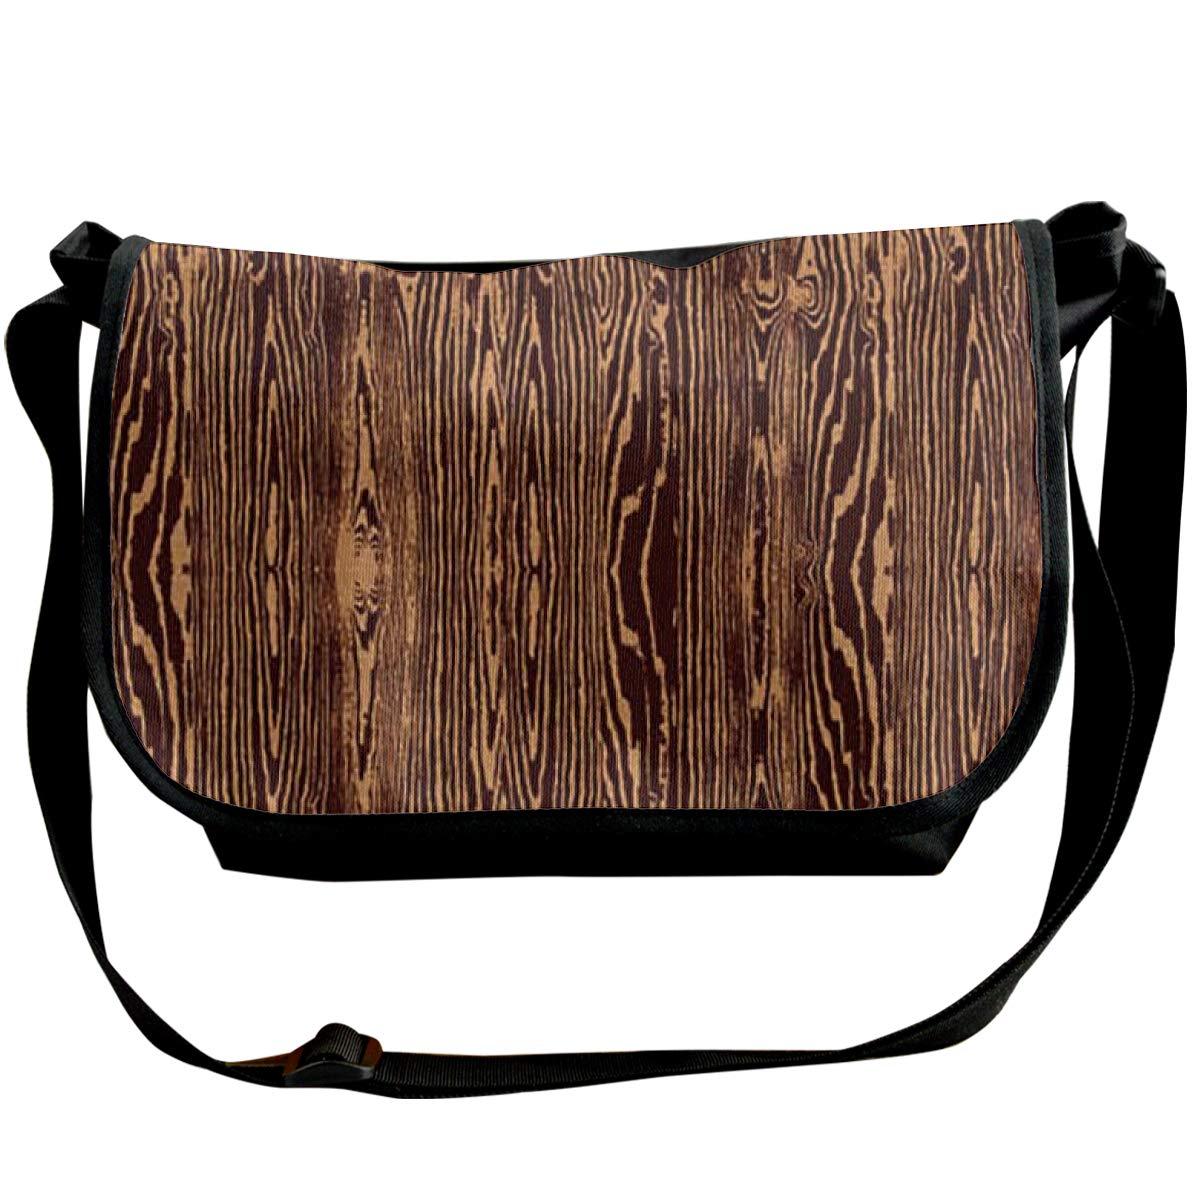 Wood Grain Fabric Unisex Crossbody Single Shoulder Bag Lightweight Bag With Adjustable Strap Travelling Bag